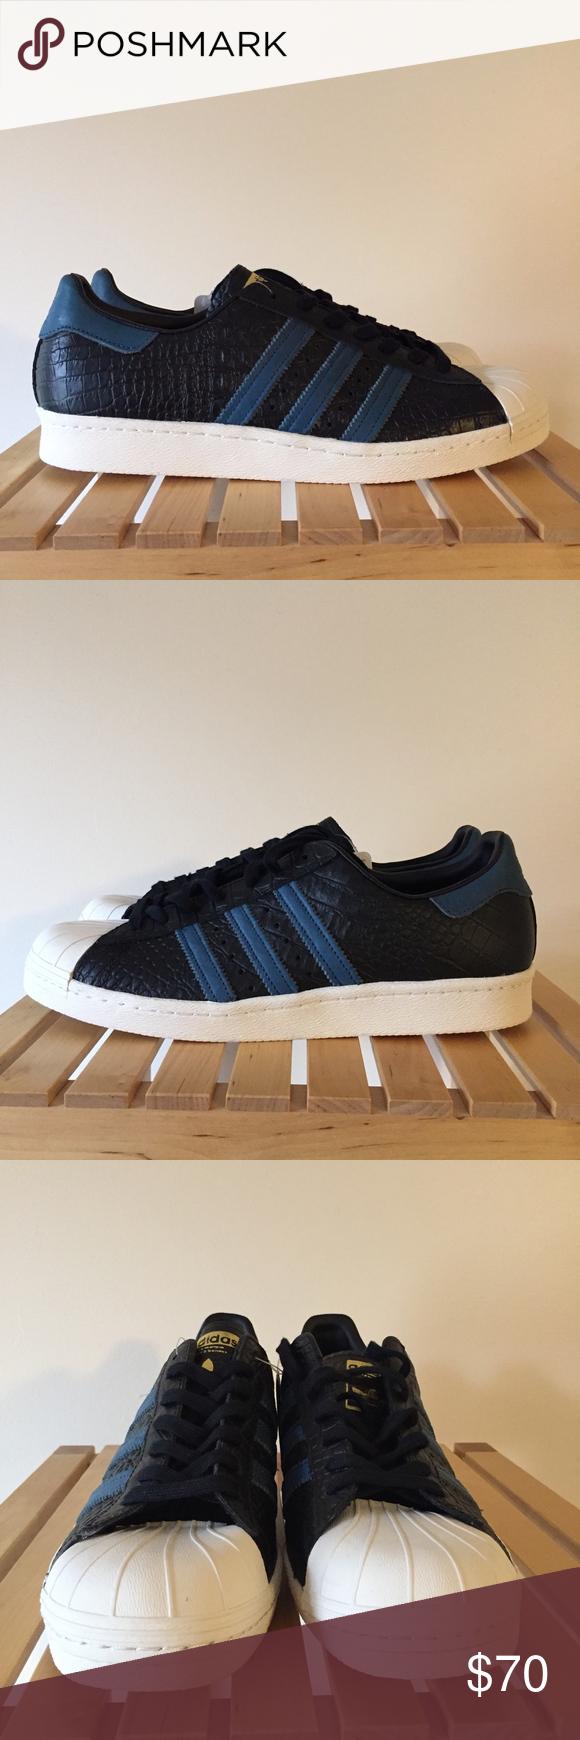 low cost c904e f04fd Adidas Superstar 80's BB2228 Core Black Blue NEW Brand new ...